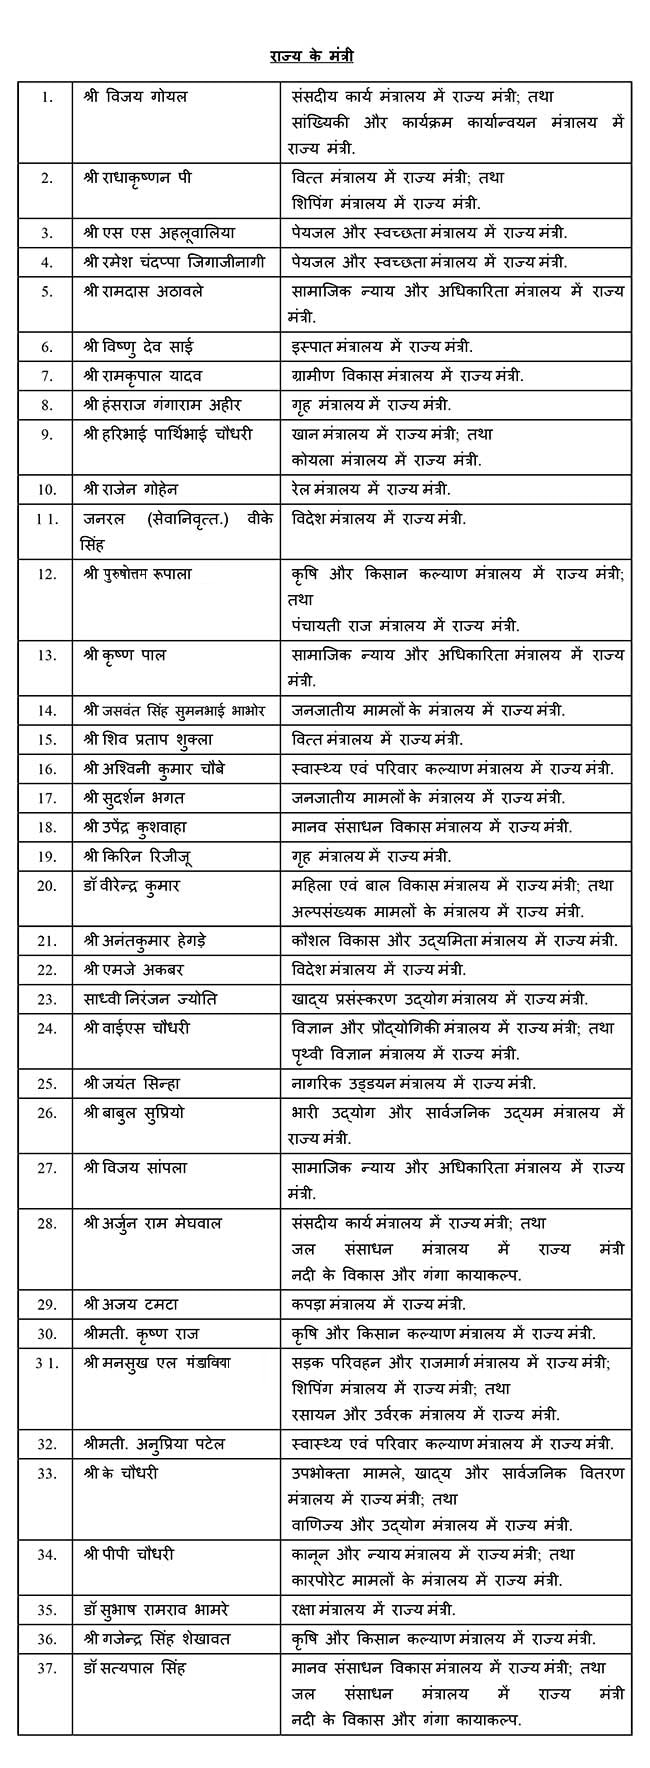 modi cabinet list pdf